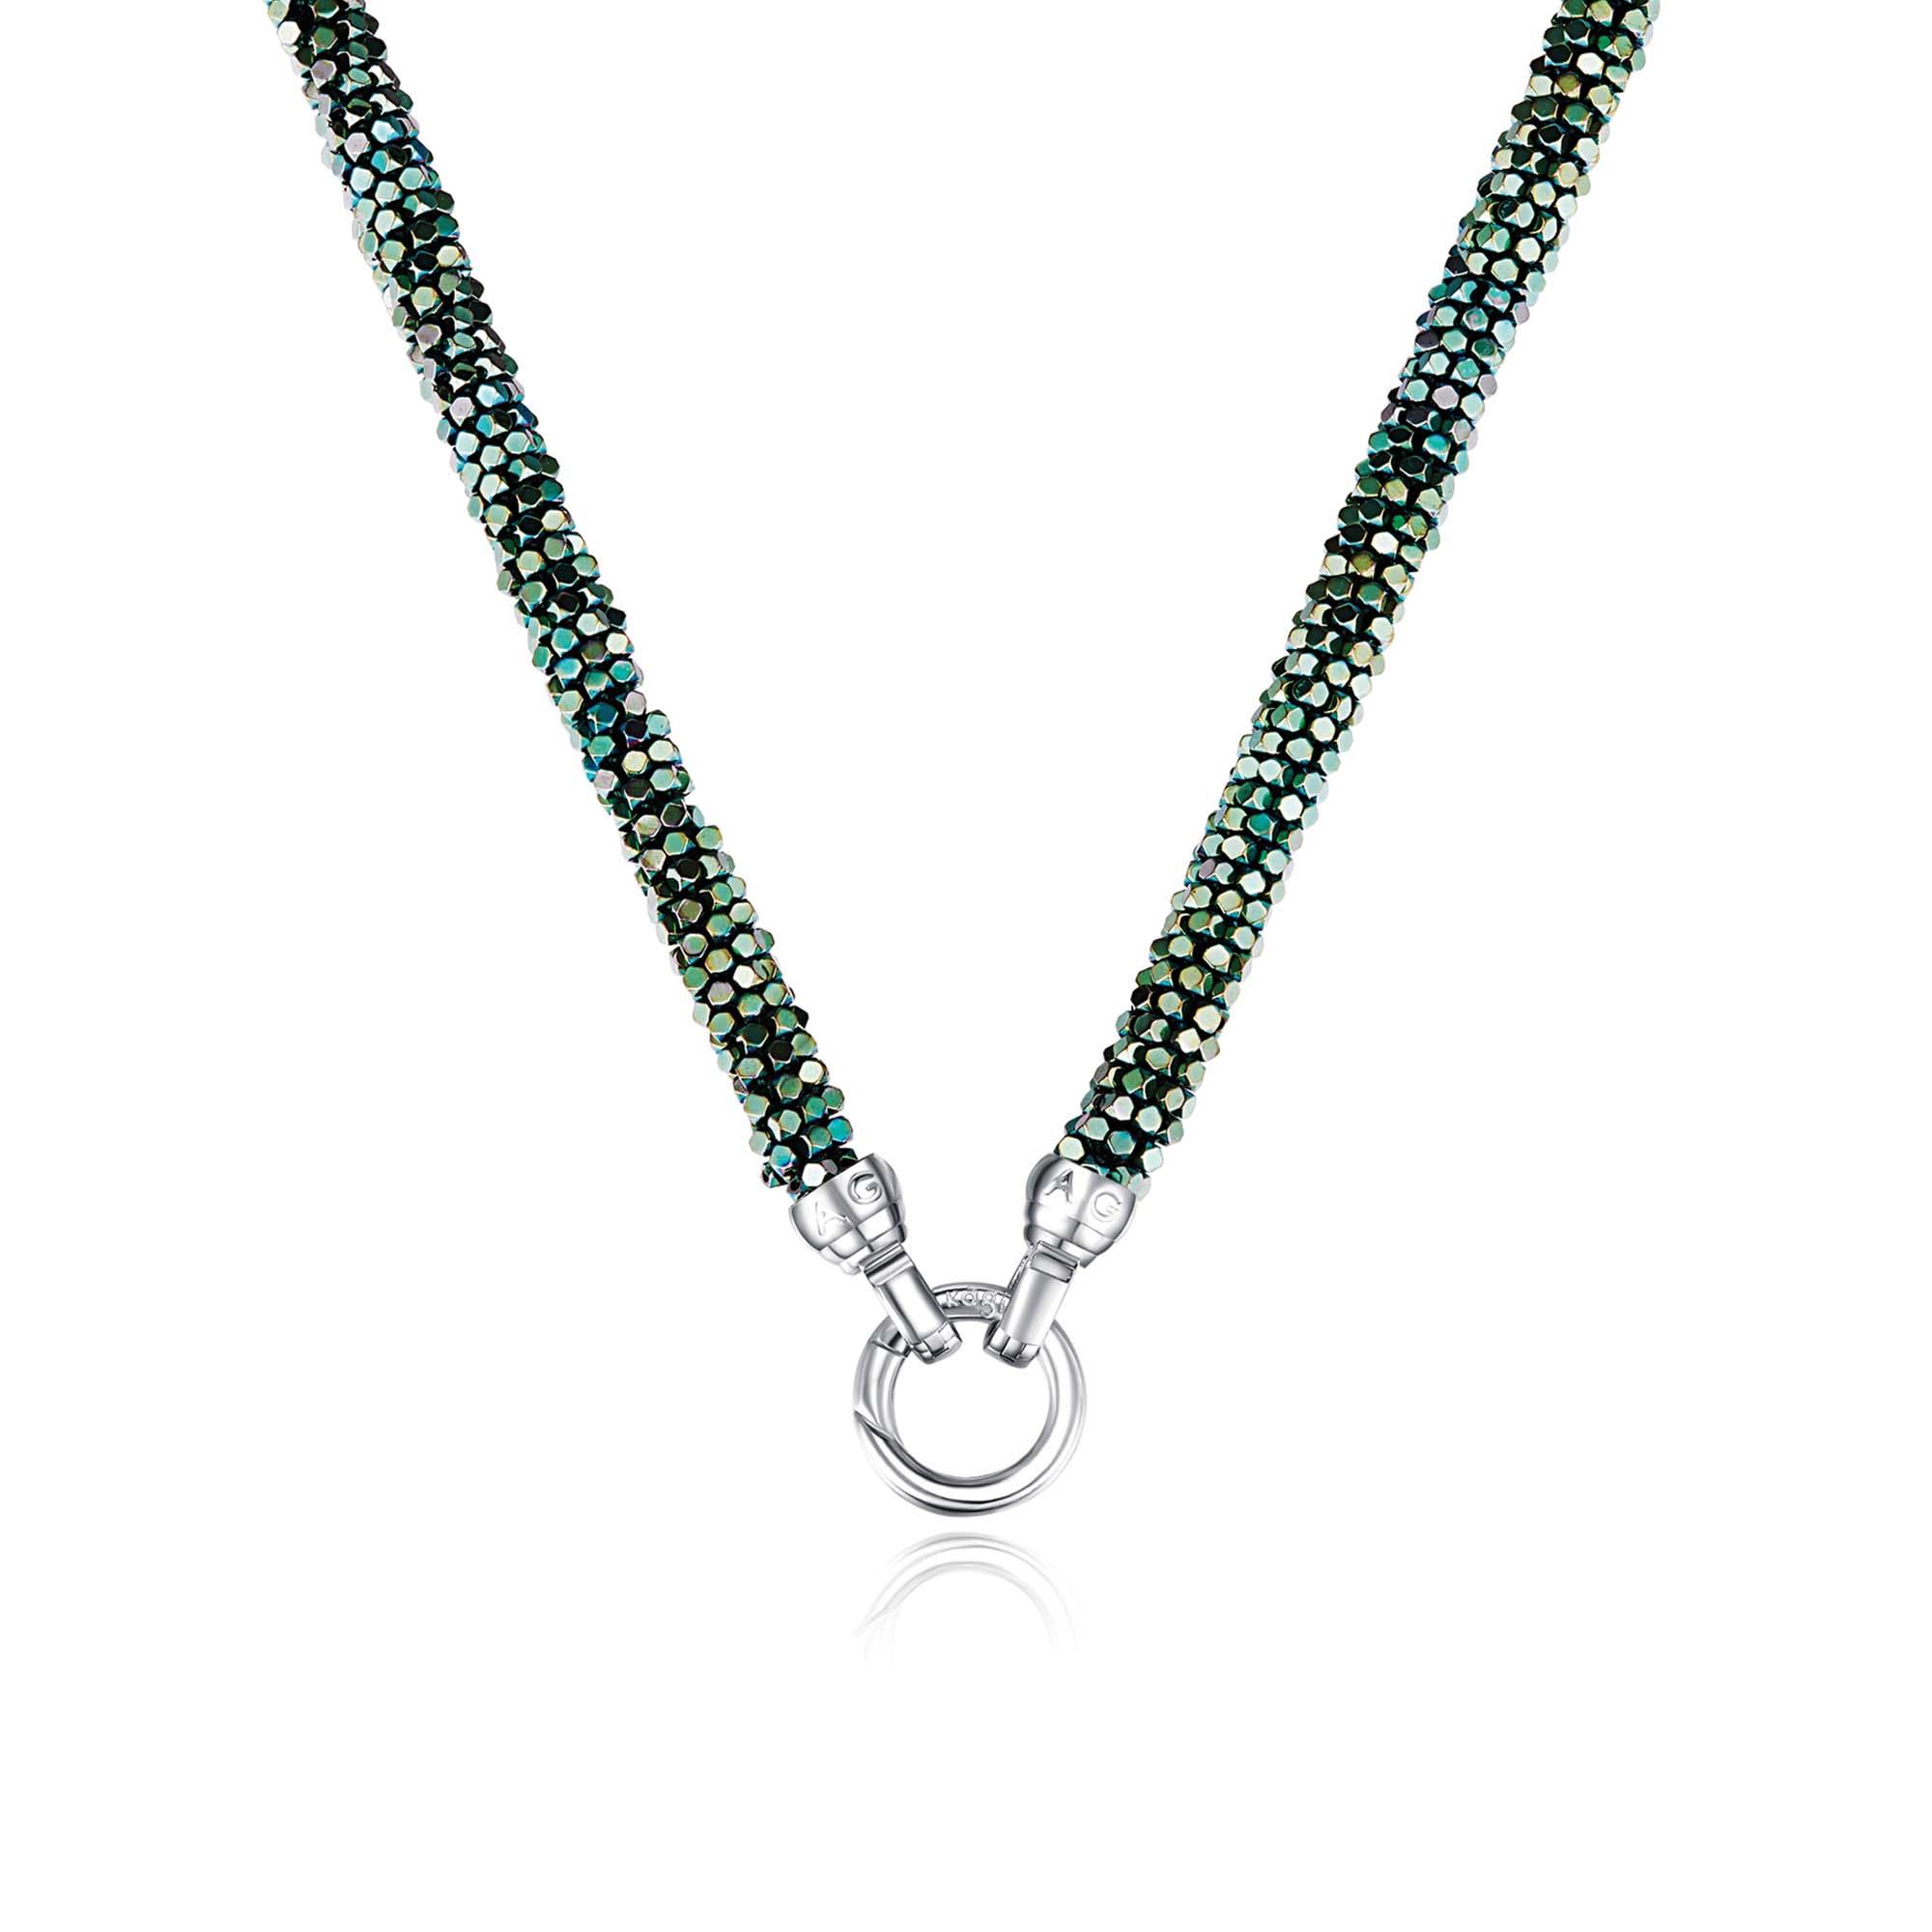 Kagi Blue Danube Weave 49cm  Necklace $249 www.kagi.net